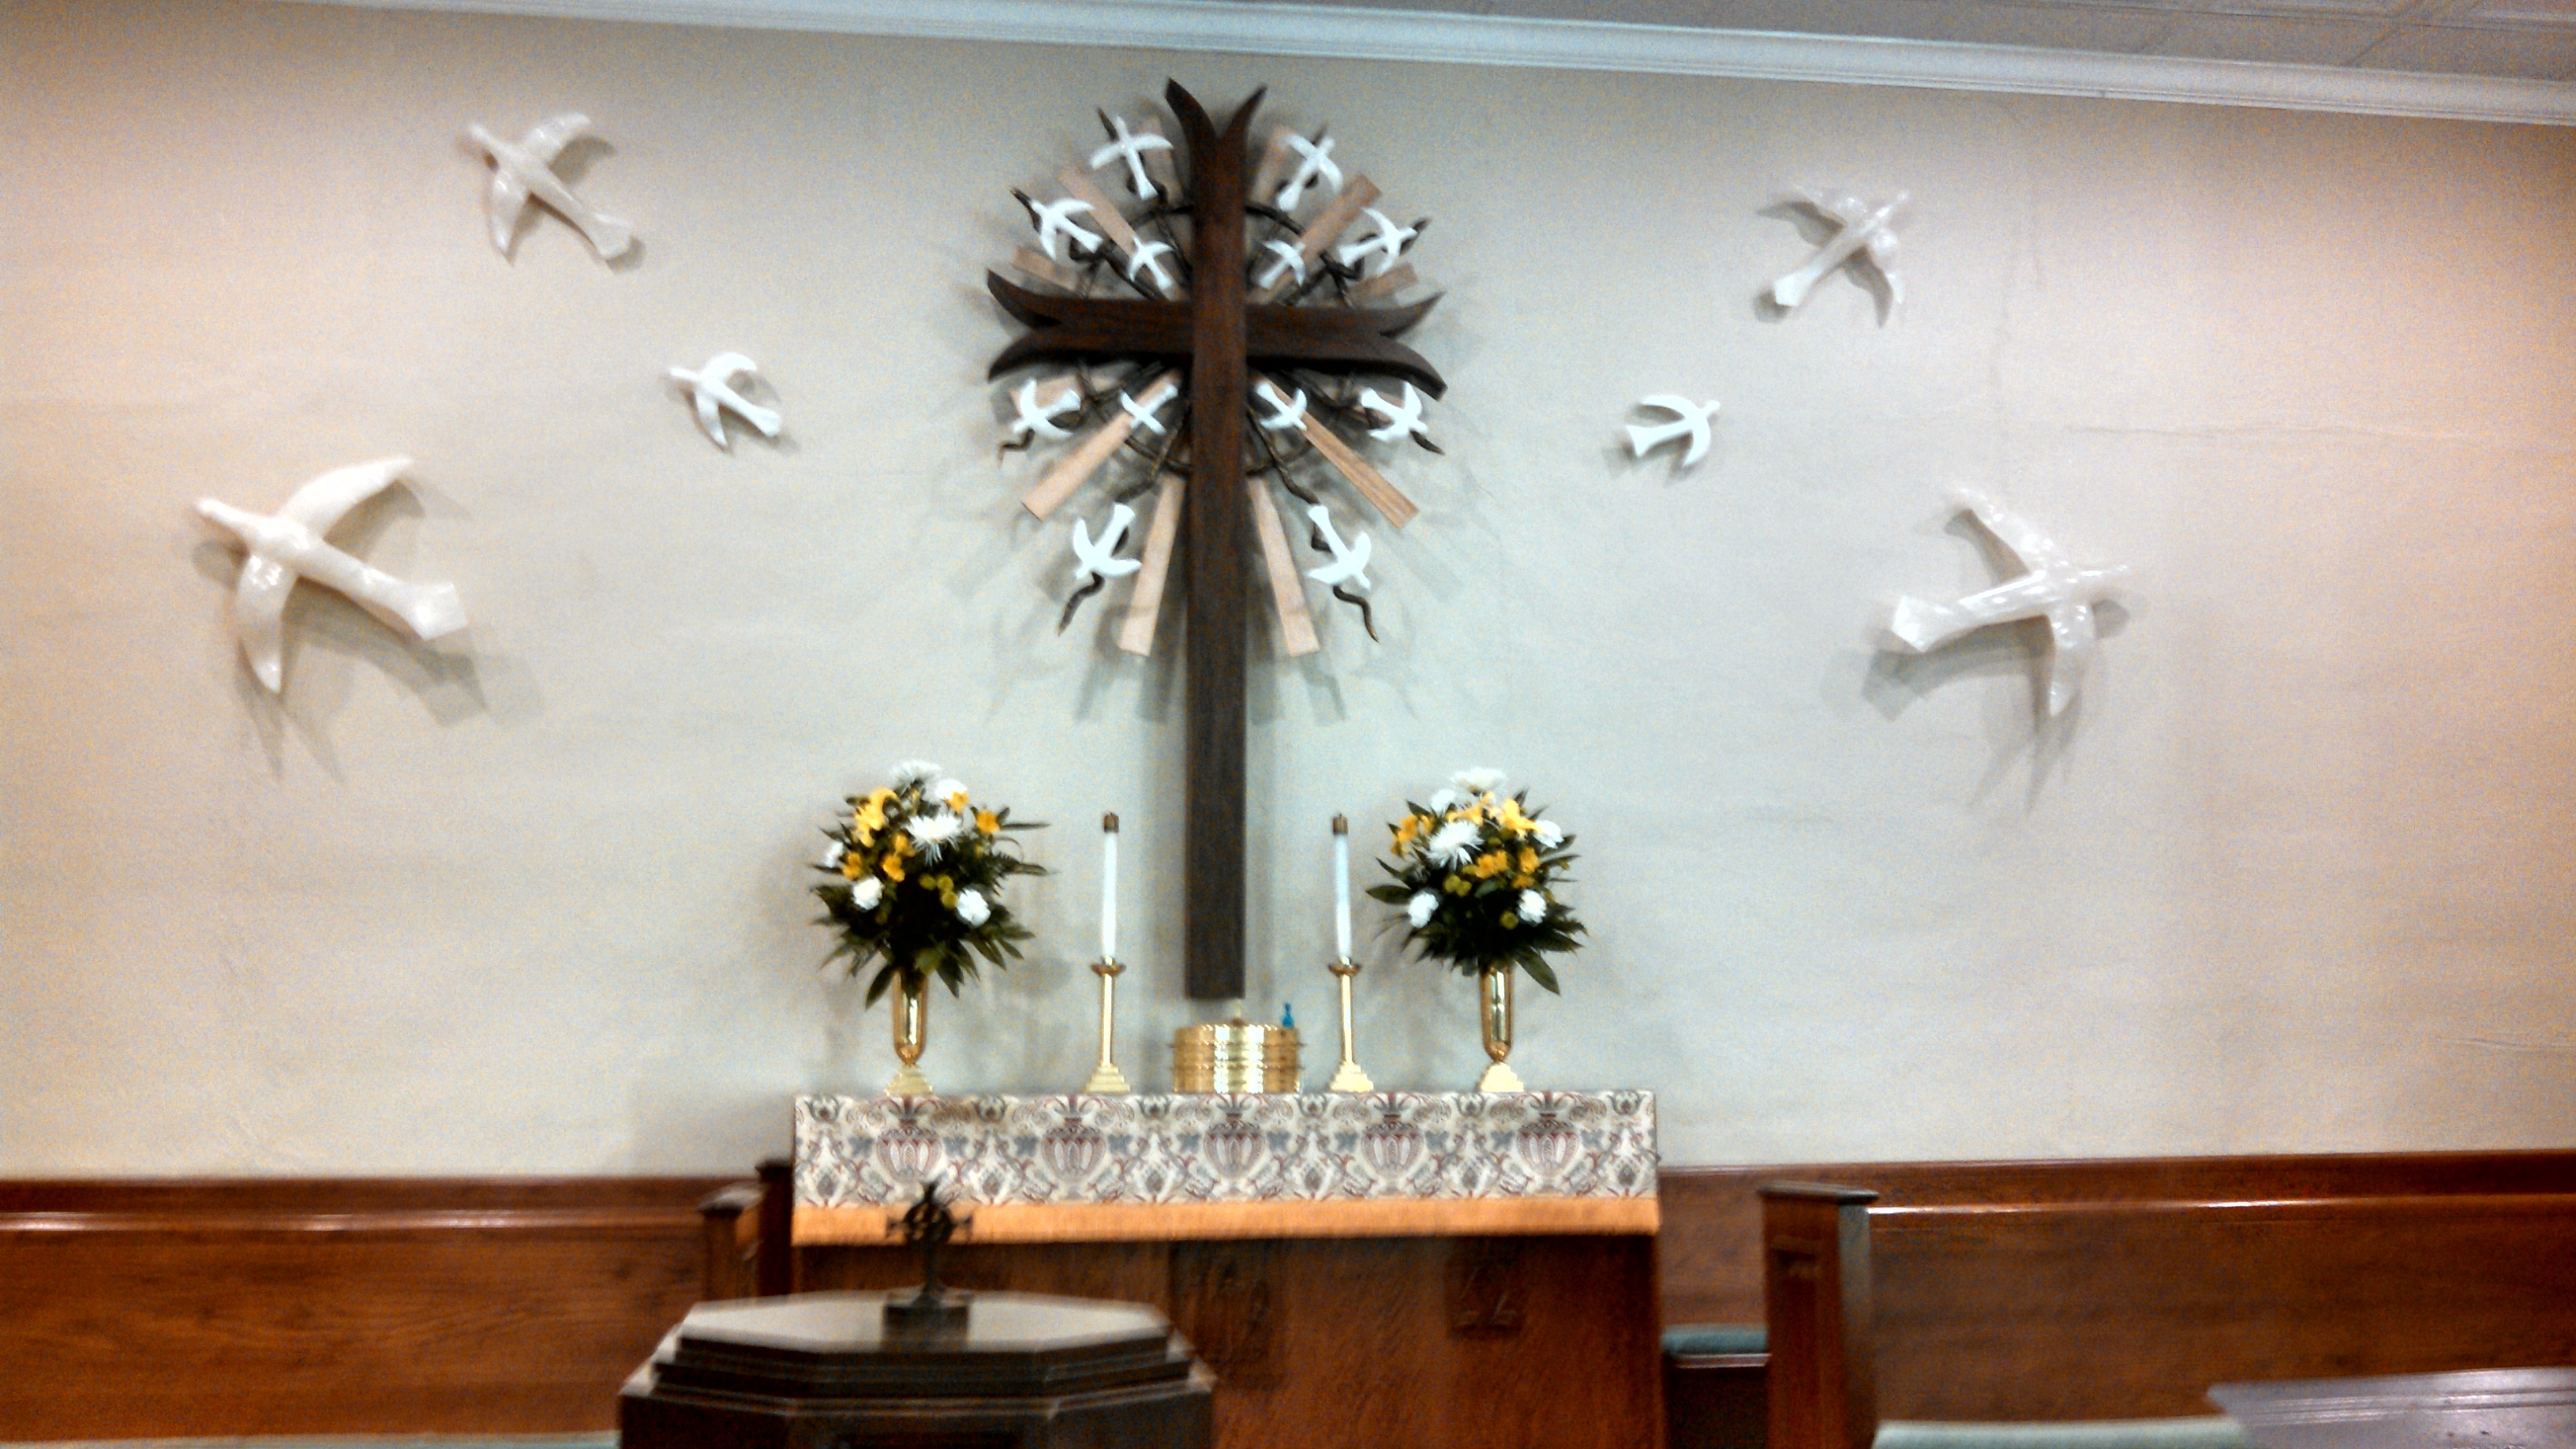 Austinville United Methodist Church